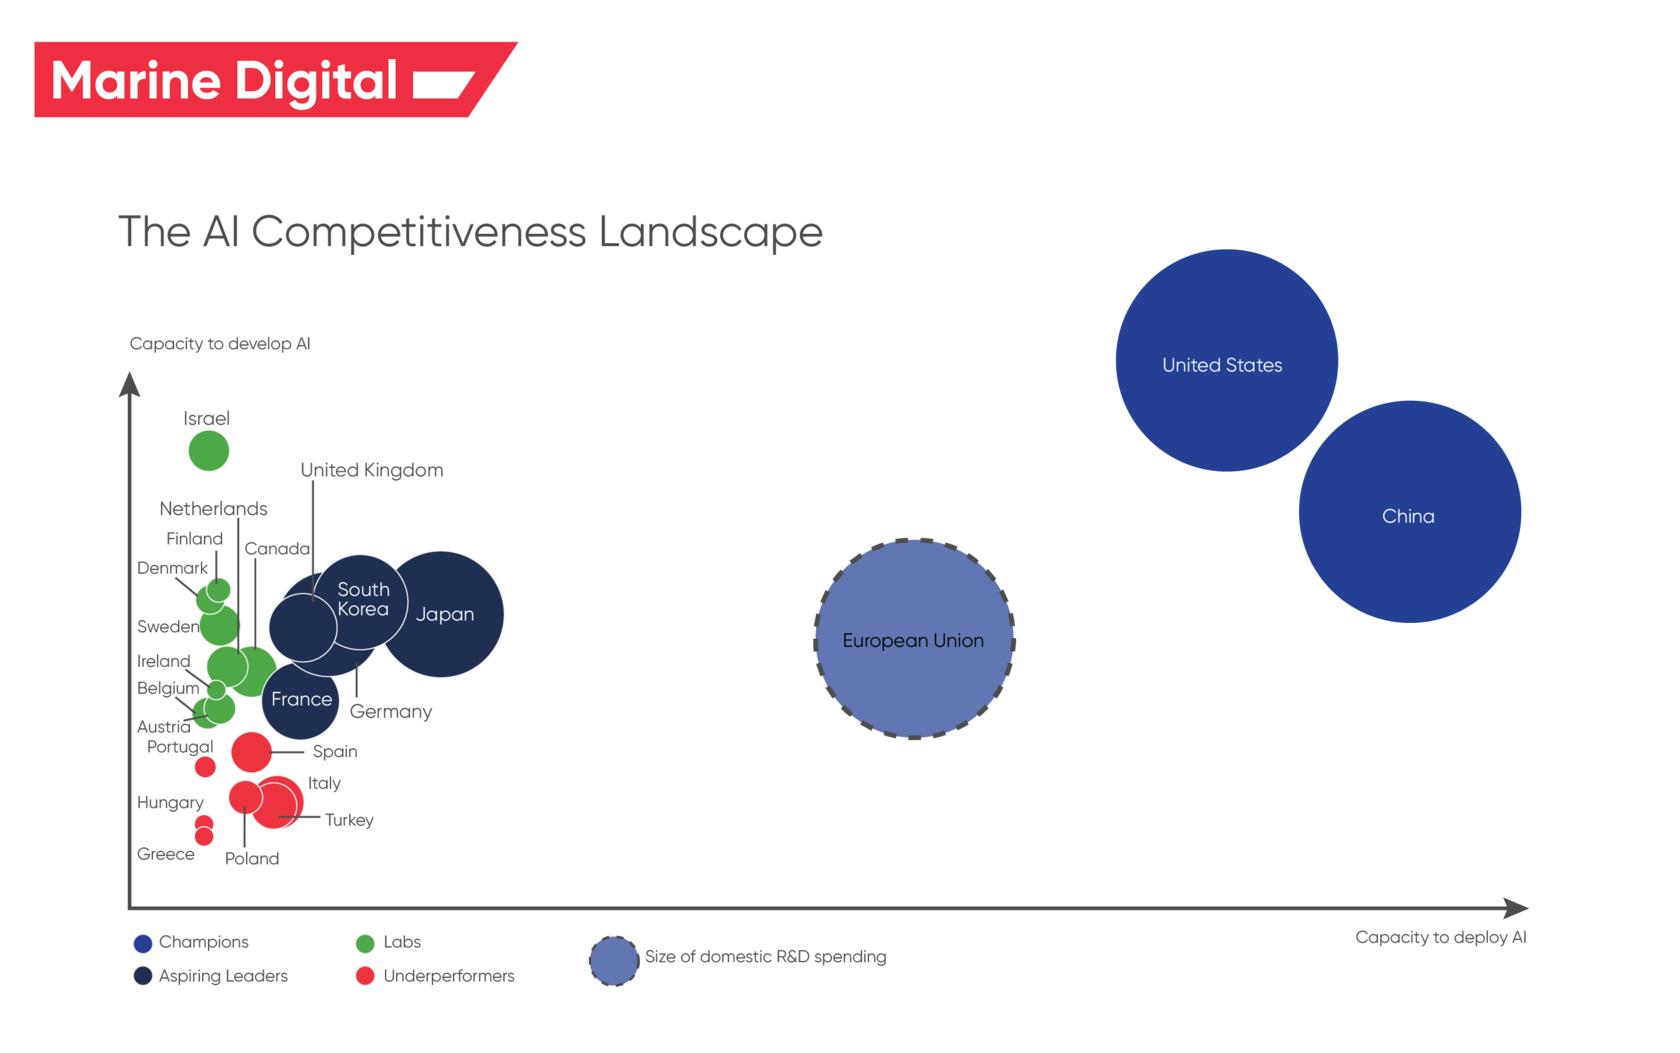 The AI Competitiveness Landscape